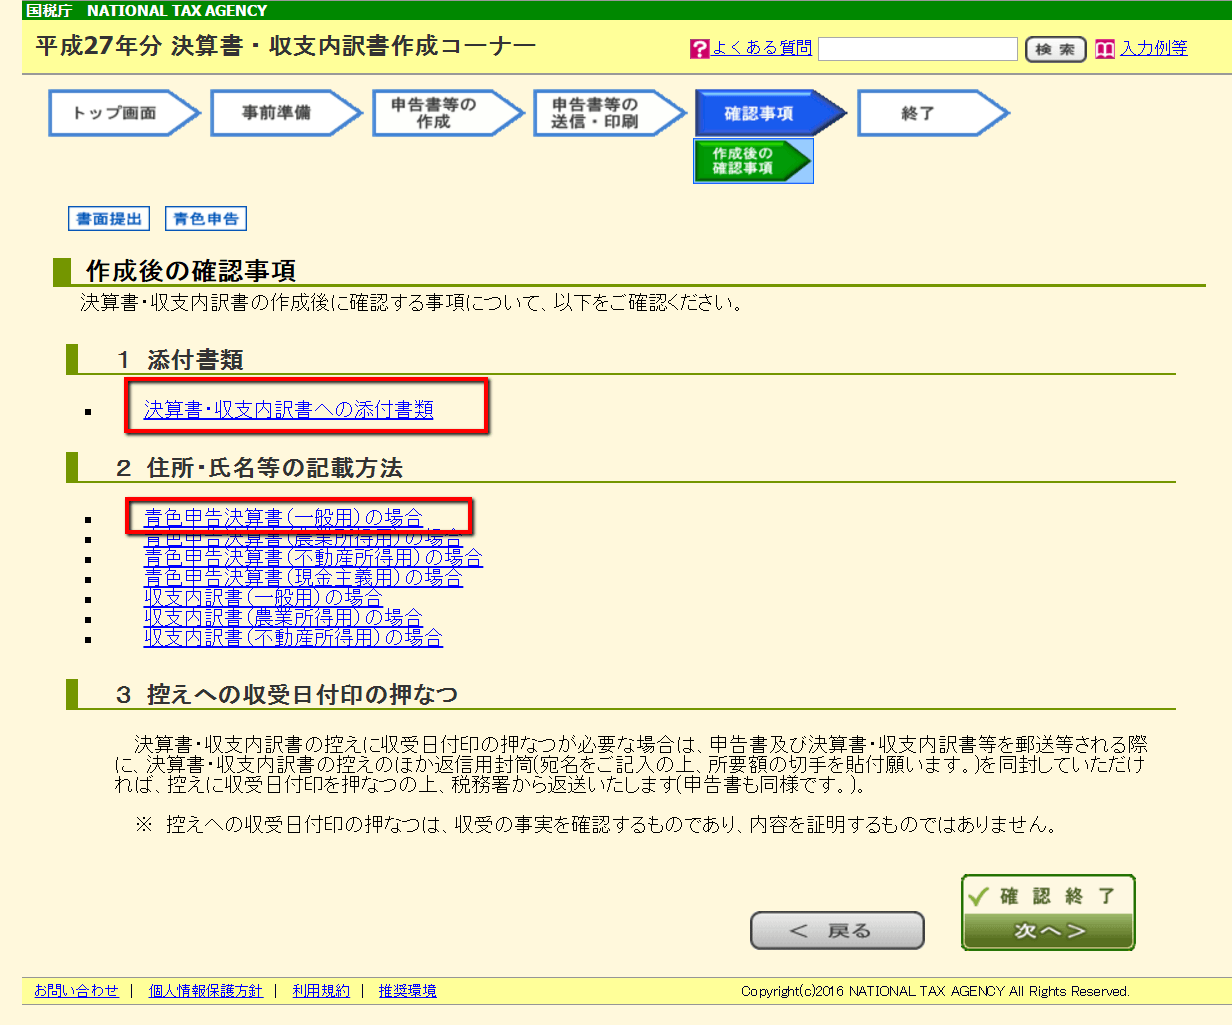 2016-03-01_1048